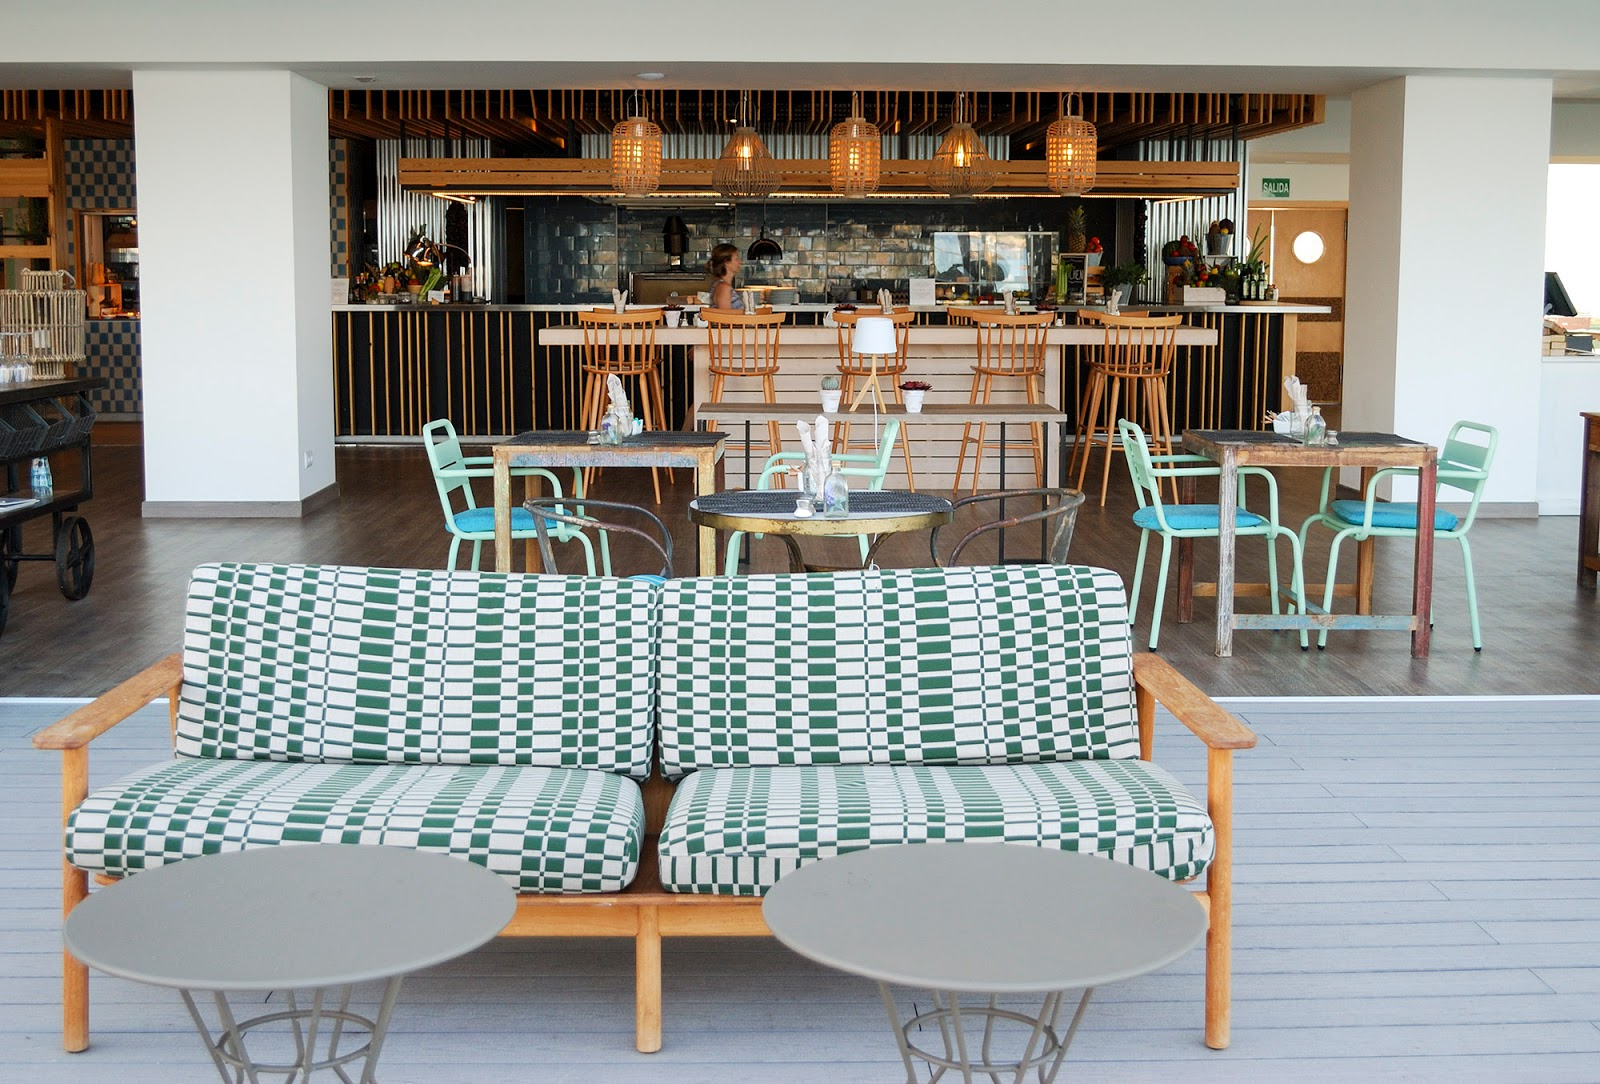 Sol Beach House Menorca Spain Melia Hotel buffet